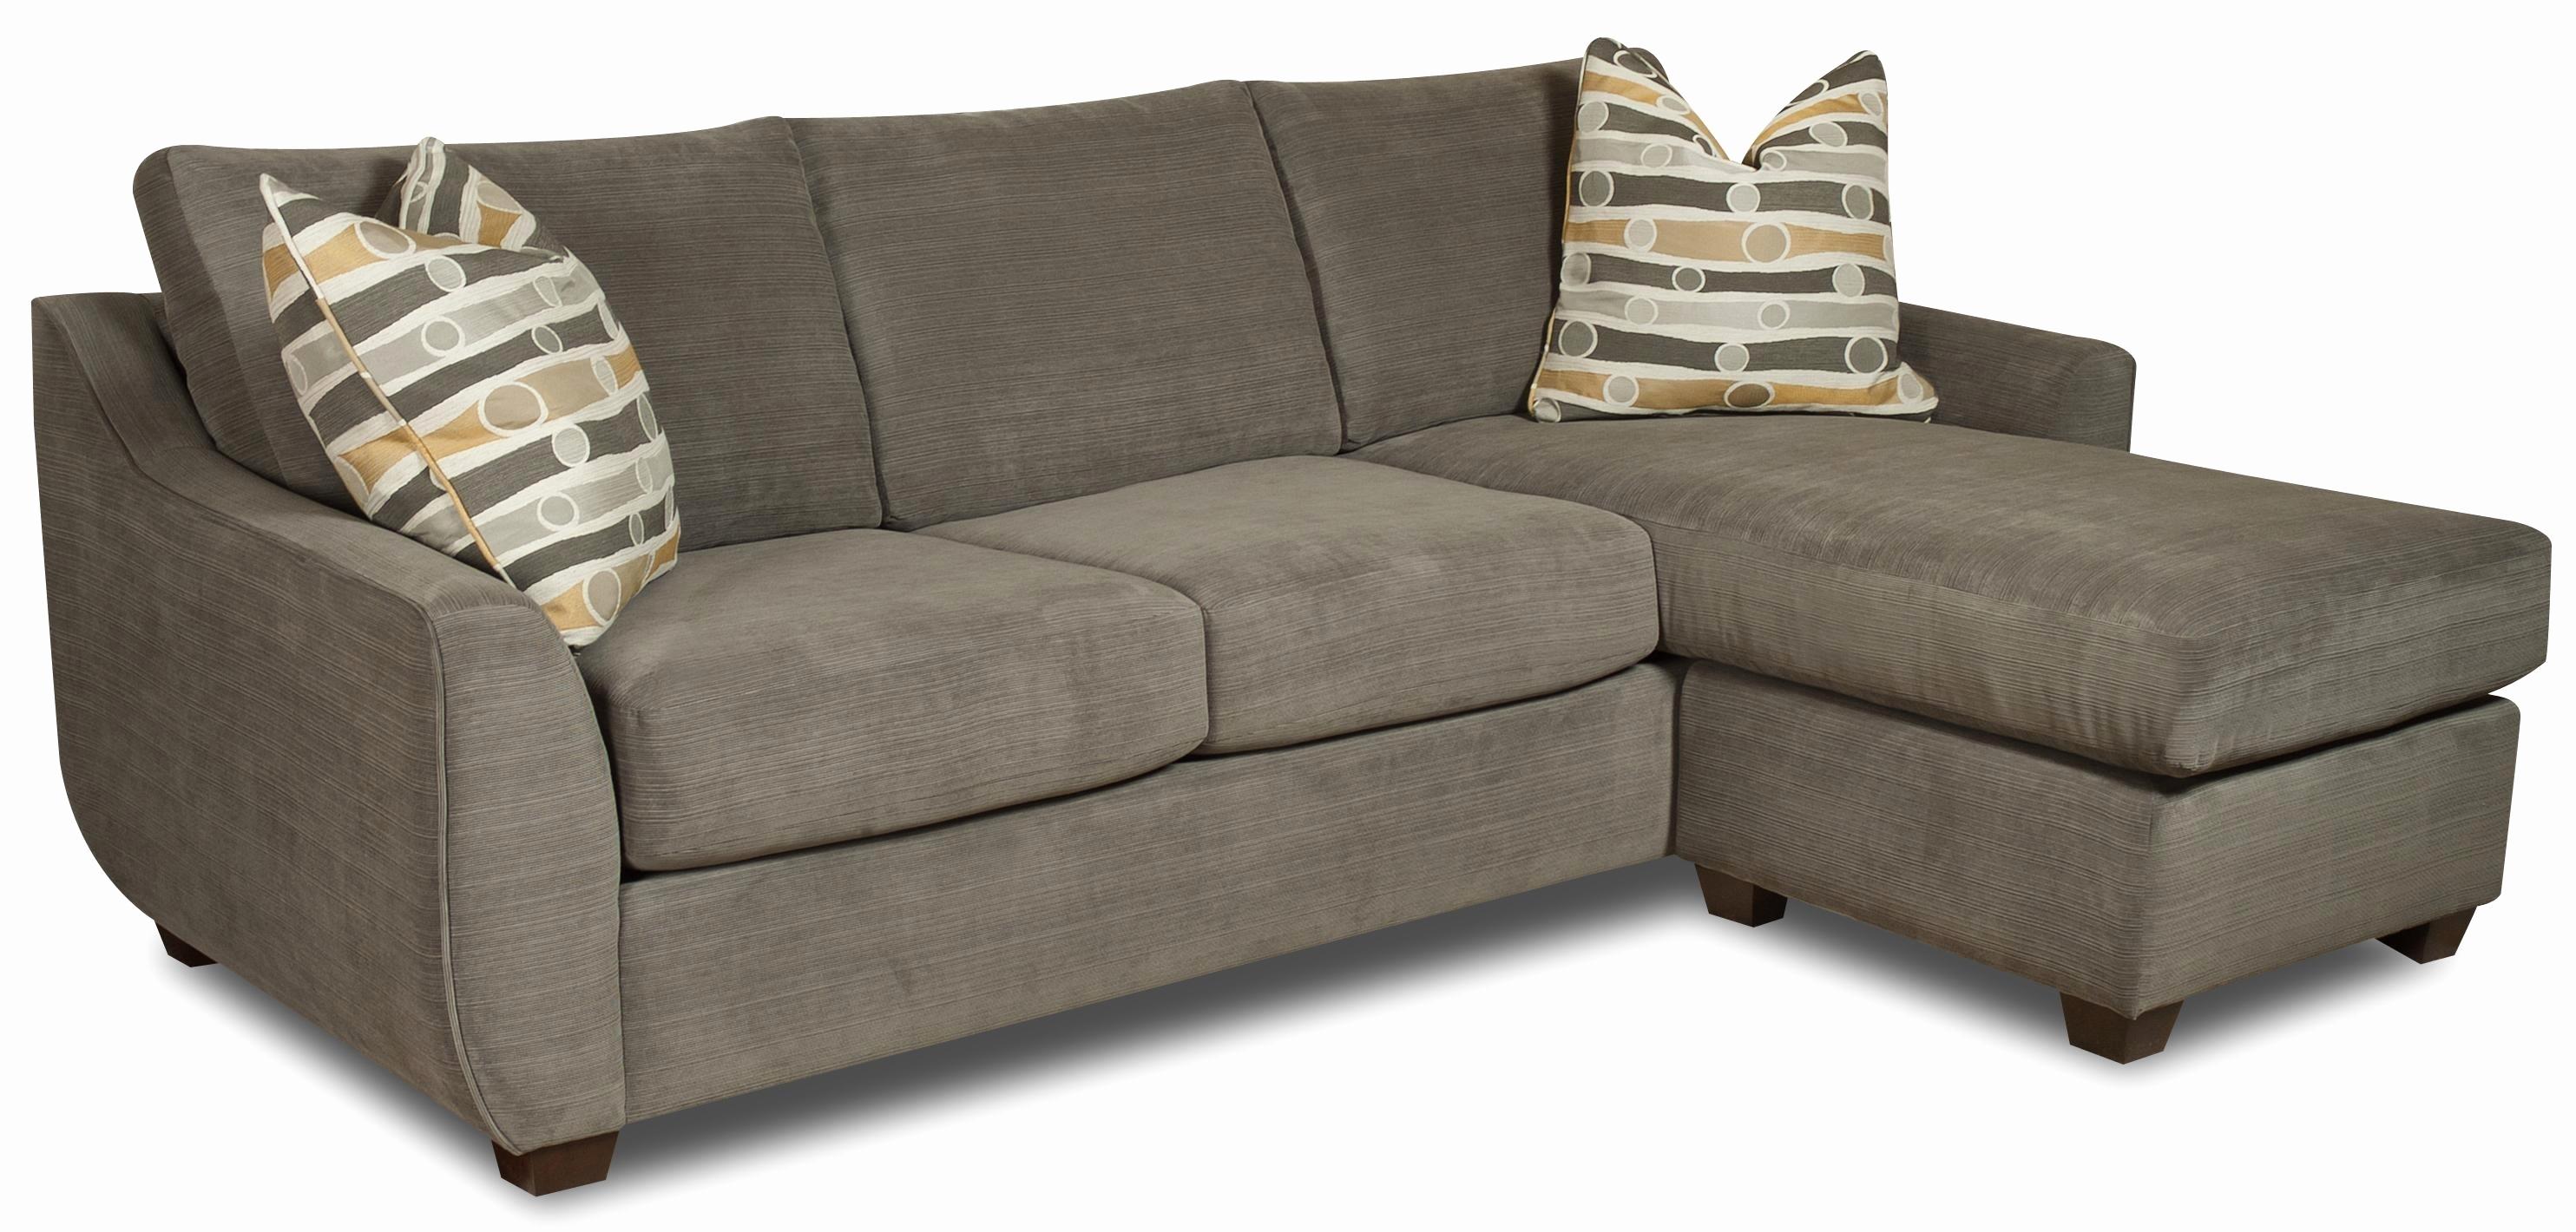 Furniture : Convertible Sectional Sleeper Sofa Elegant Bauhaus In Within Elegant Sectional Sofas (View 7 of 10)